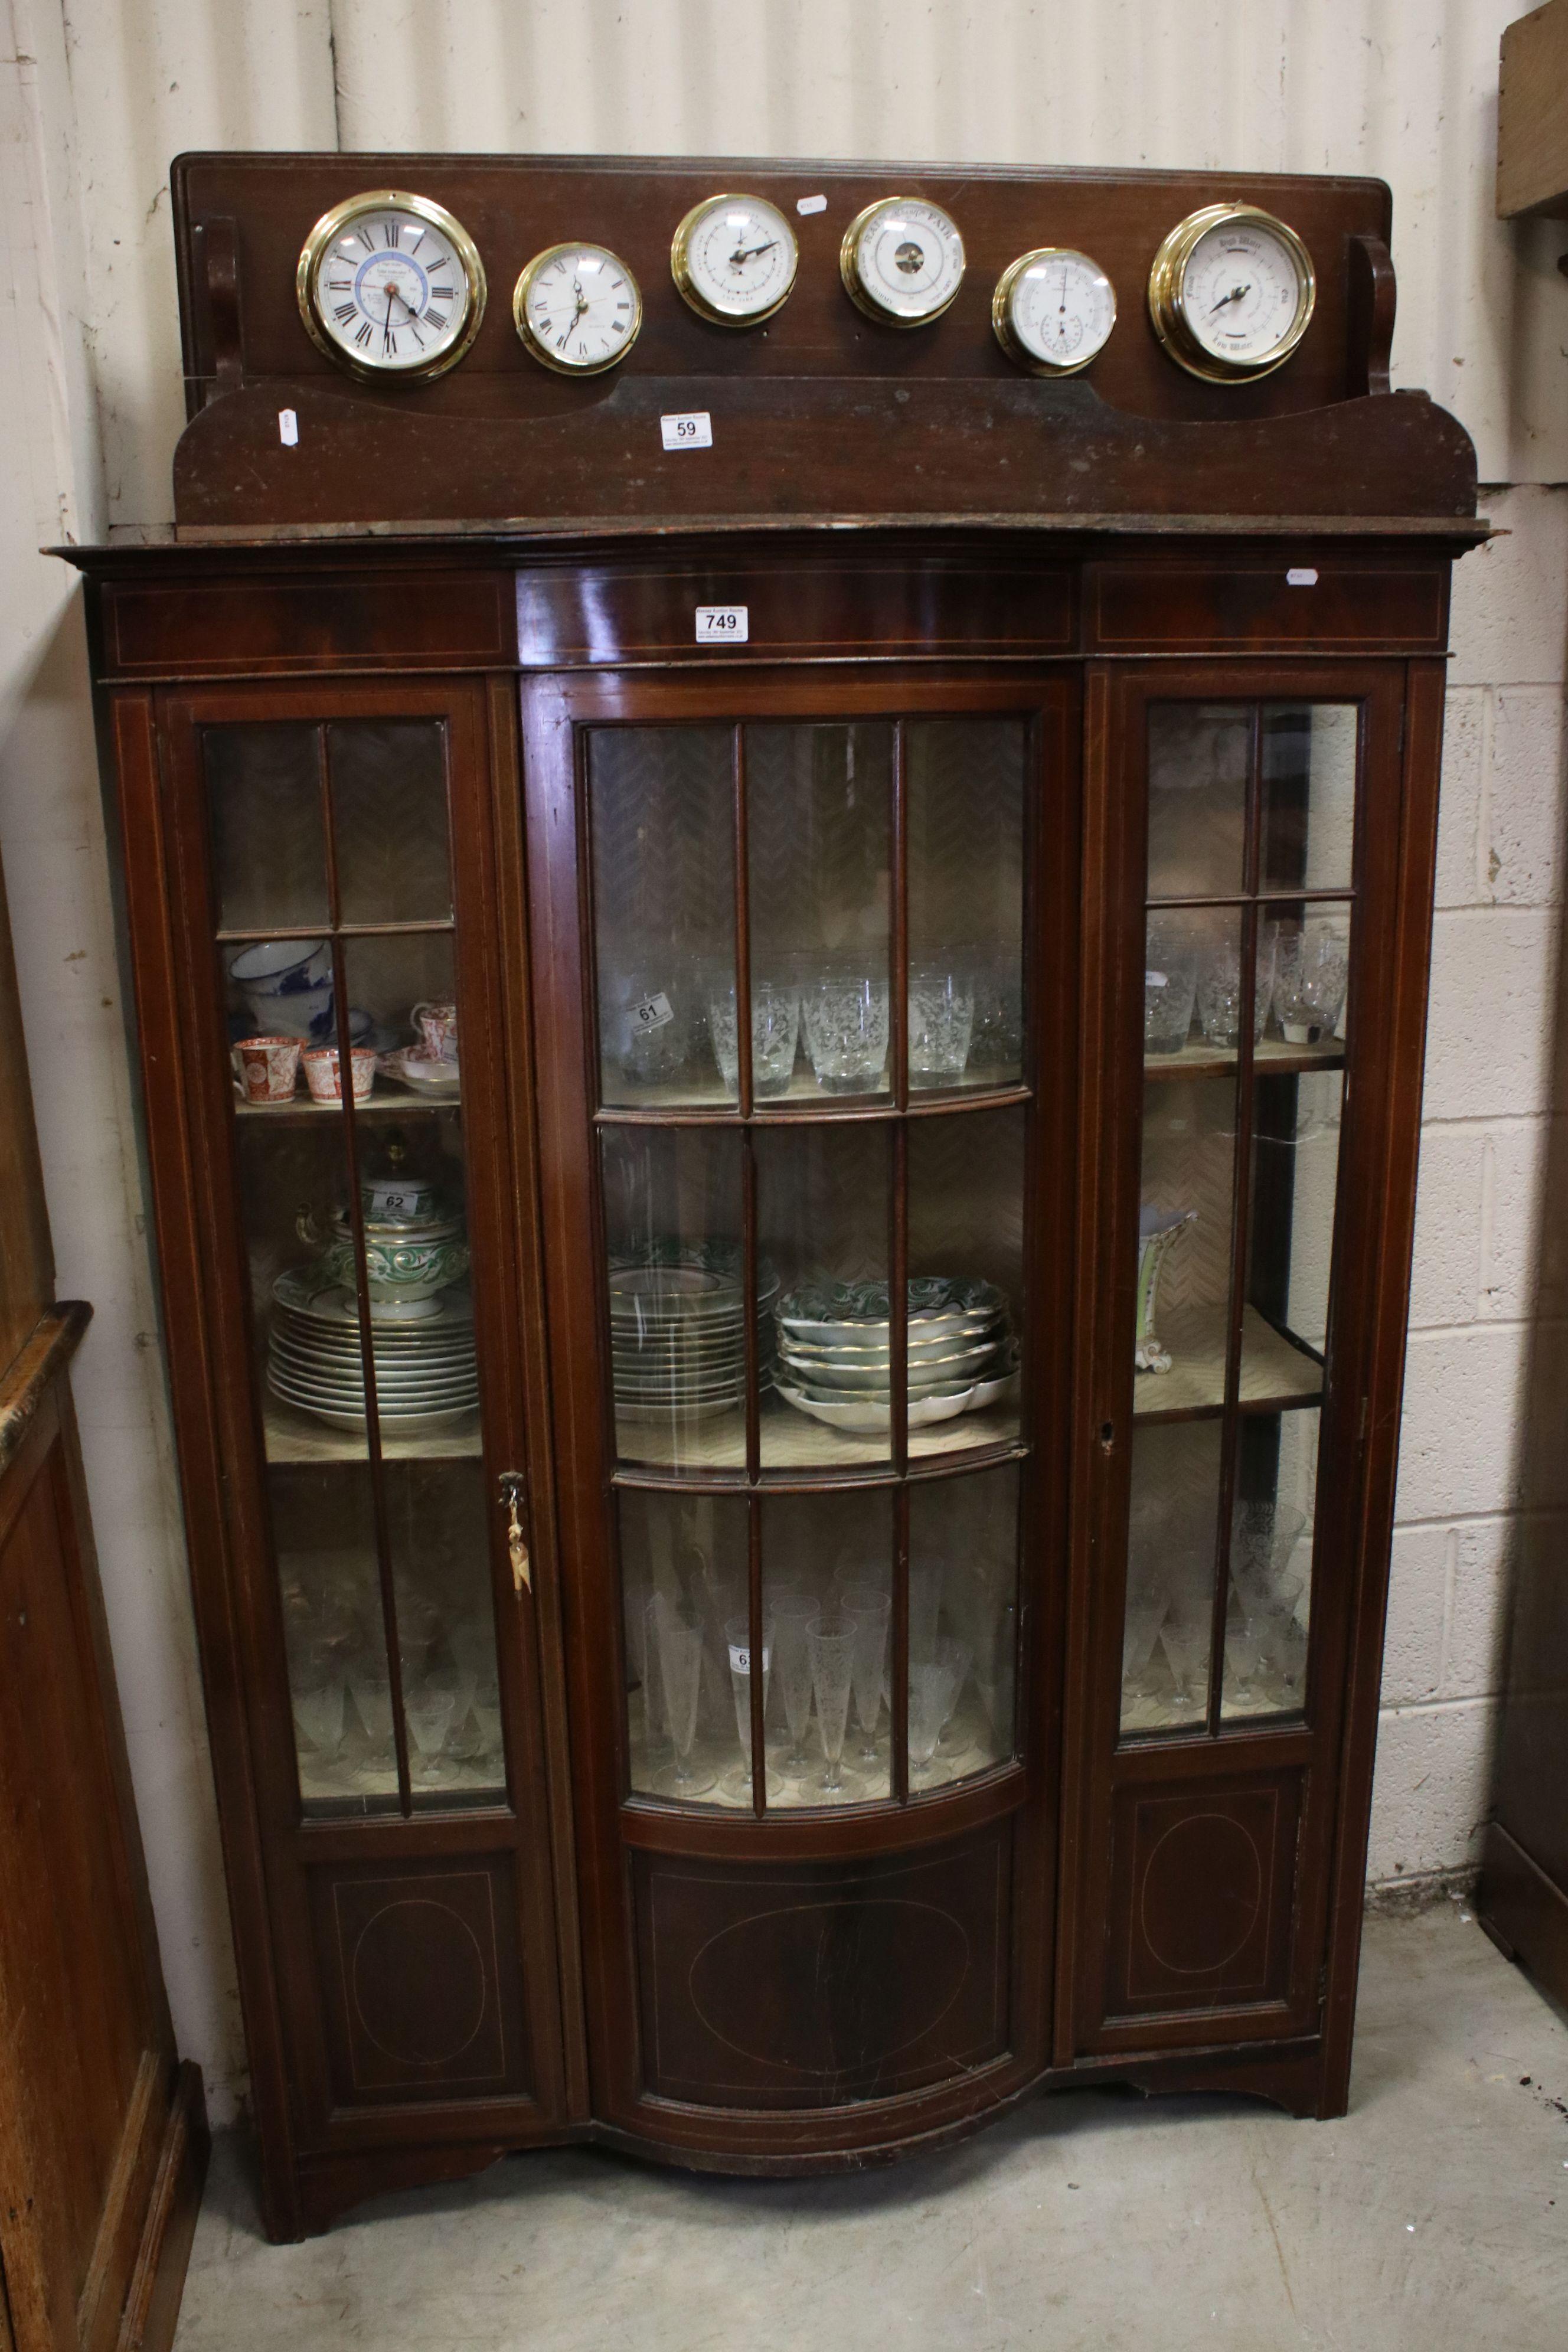 Edwardian Mahogany Inlaid Display Cabinet, 114cms wide x 153cms high